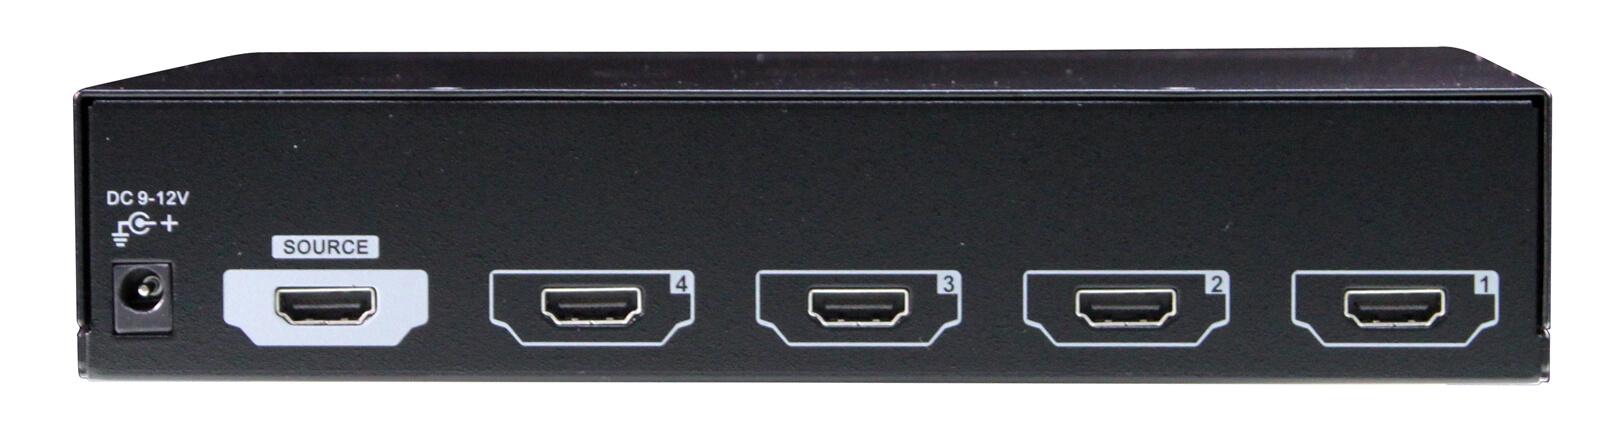 4 Ports HDMI Video Splitter